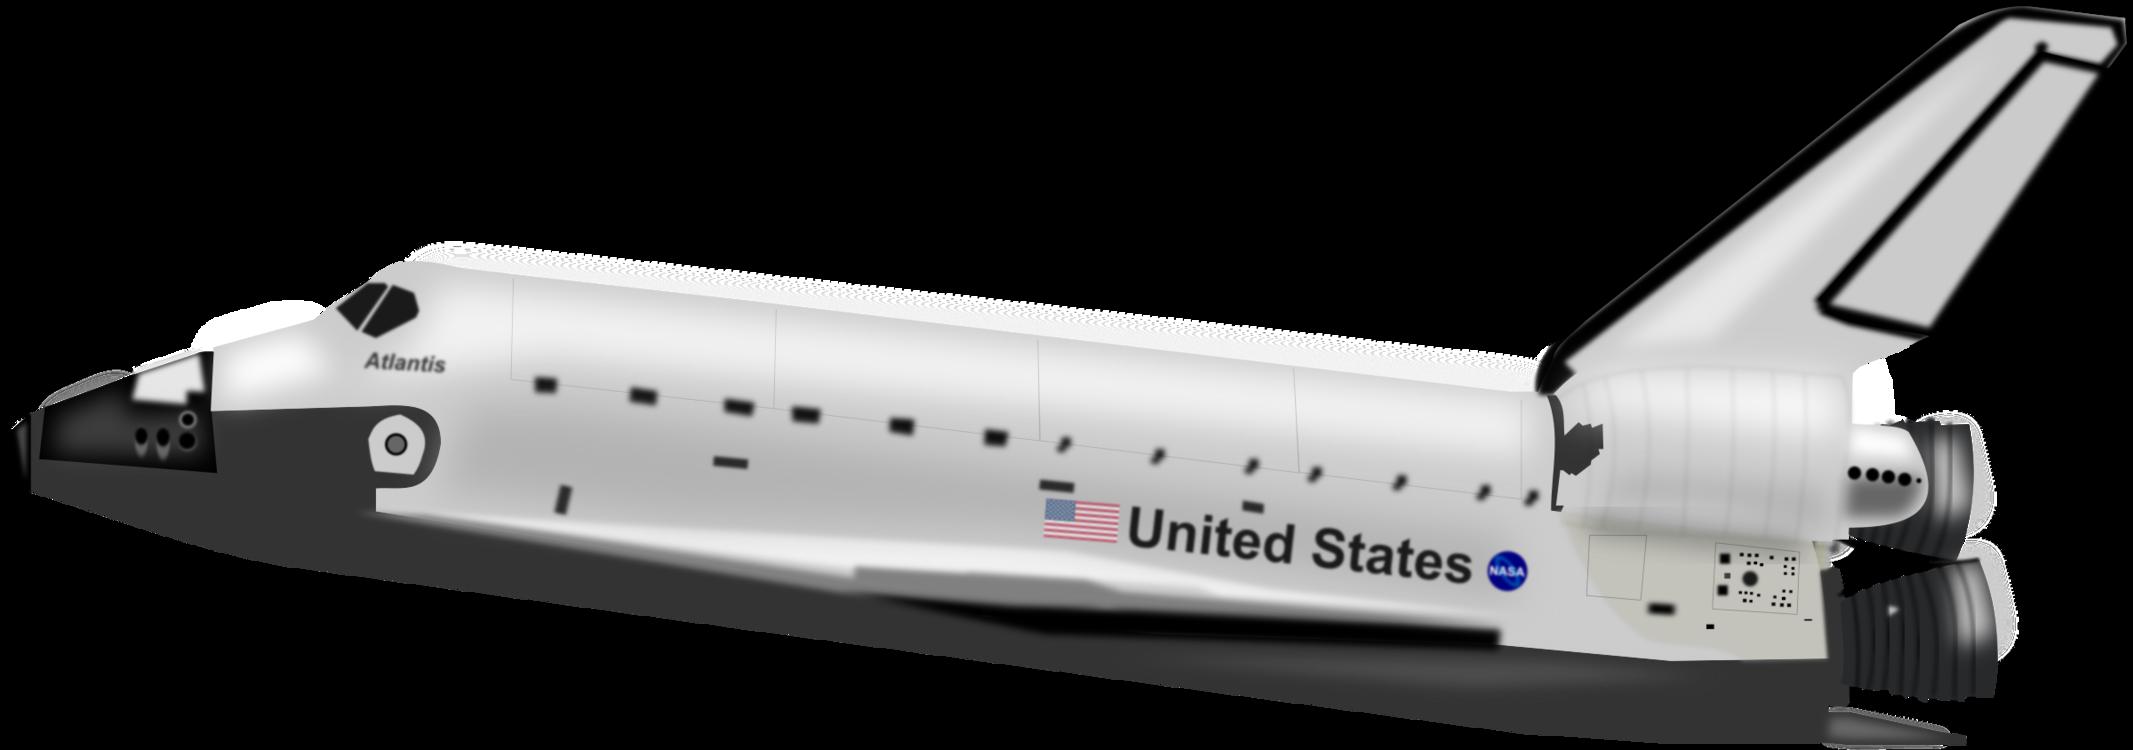 Angle,Airliner,Cylinder